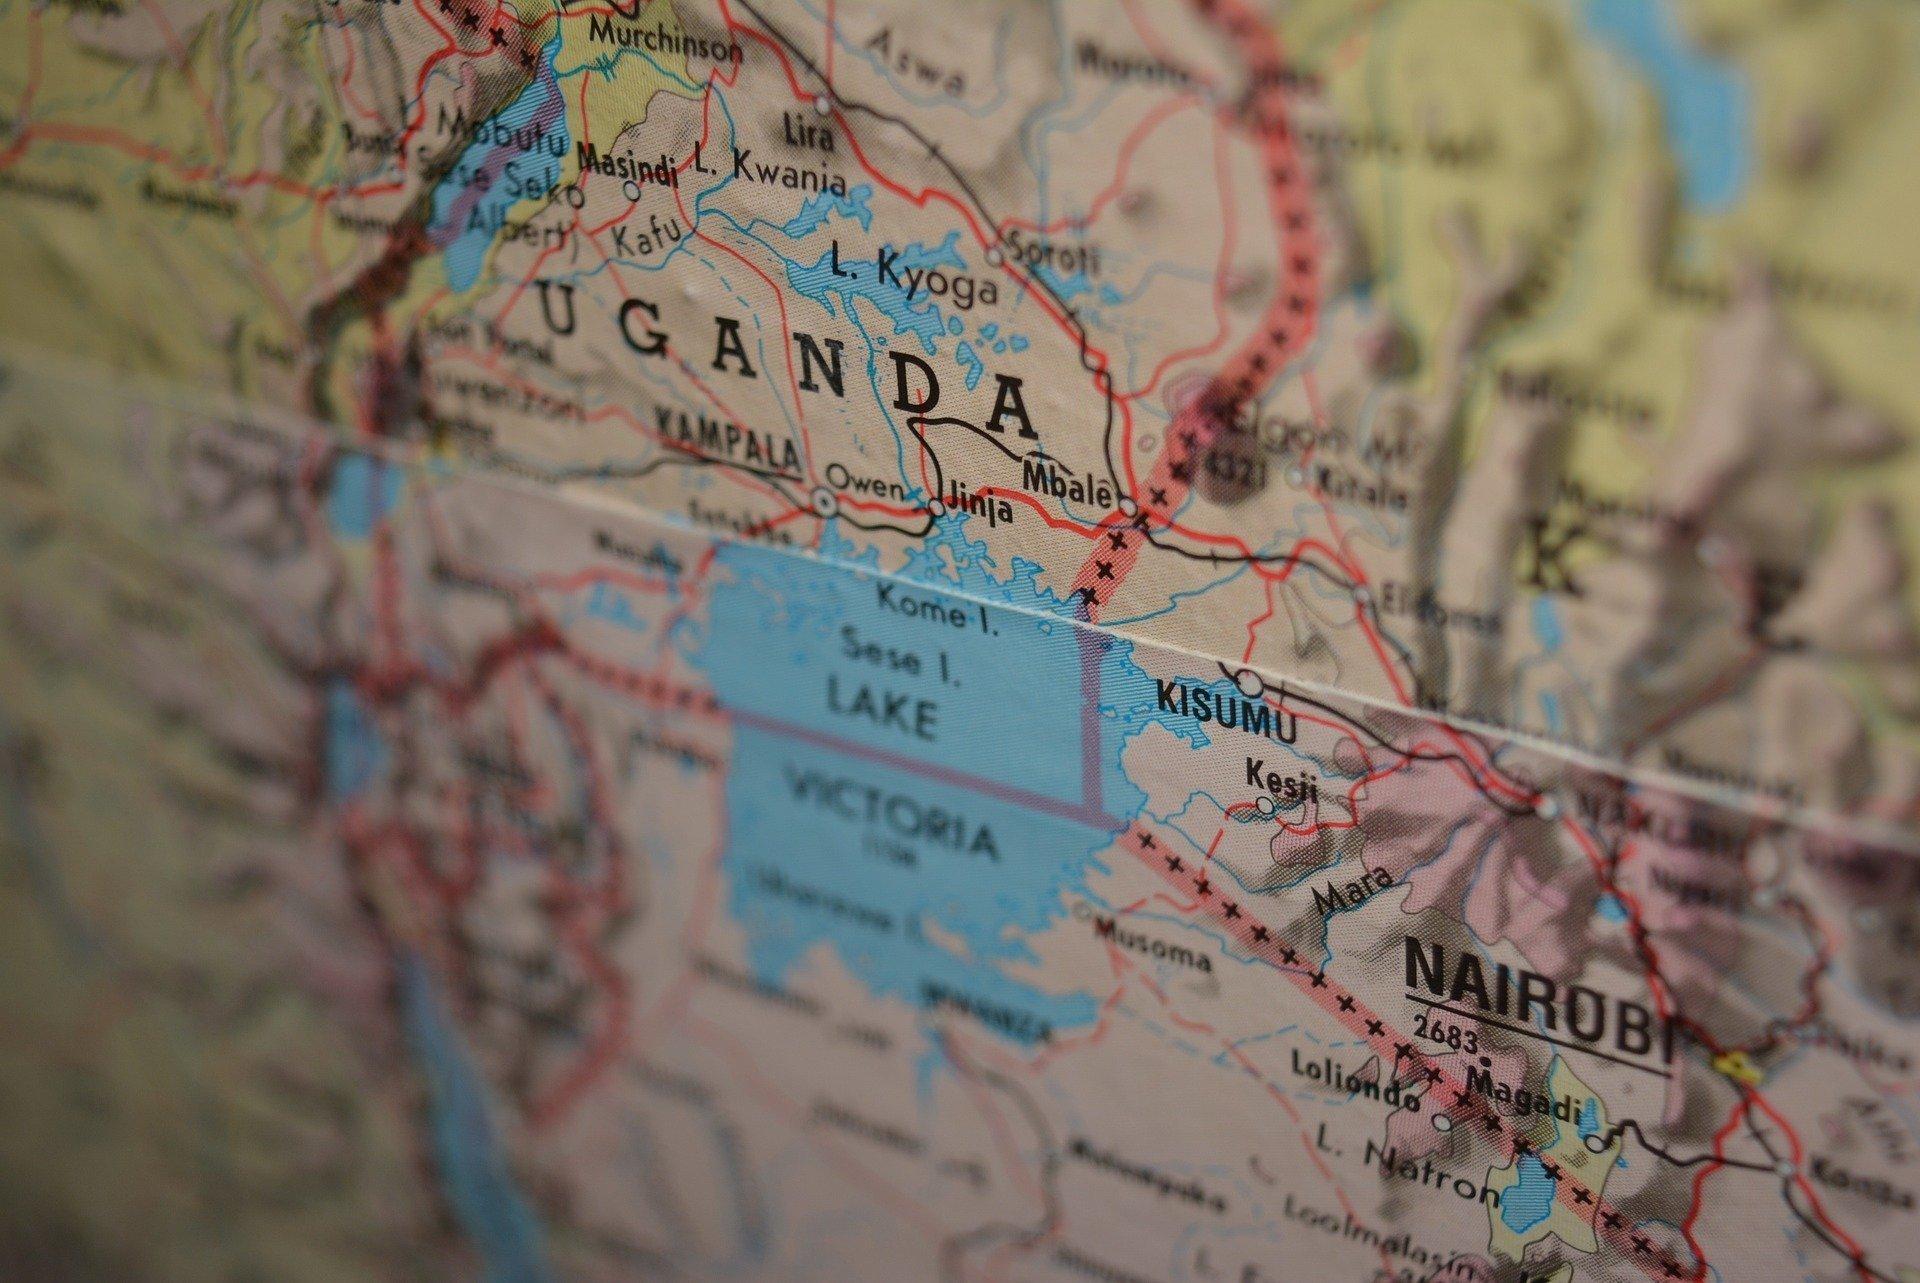 Photograph of a close-up map of Uganda